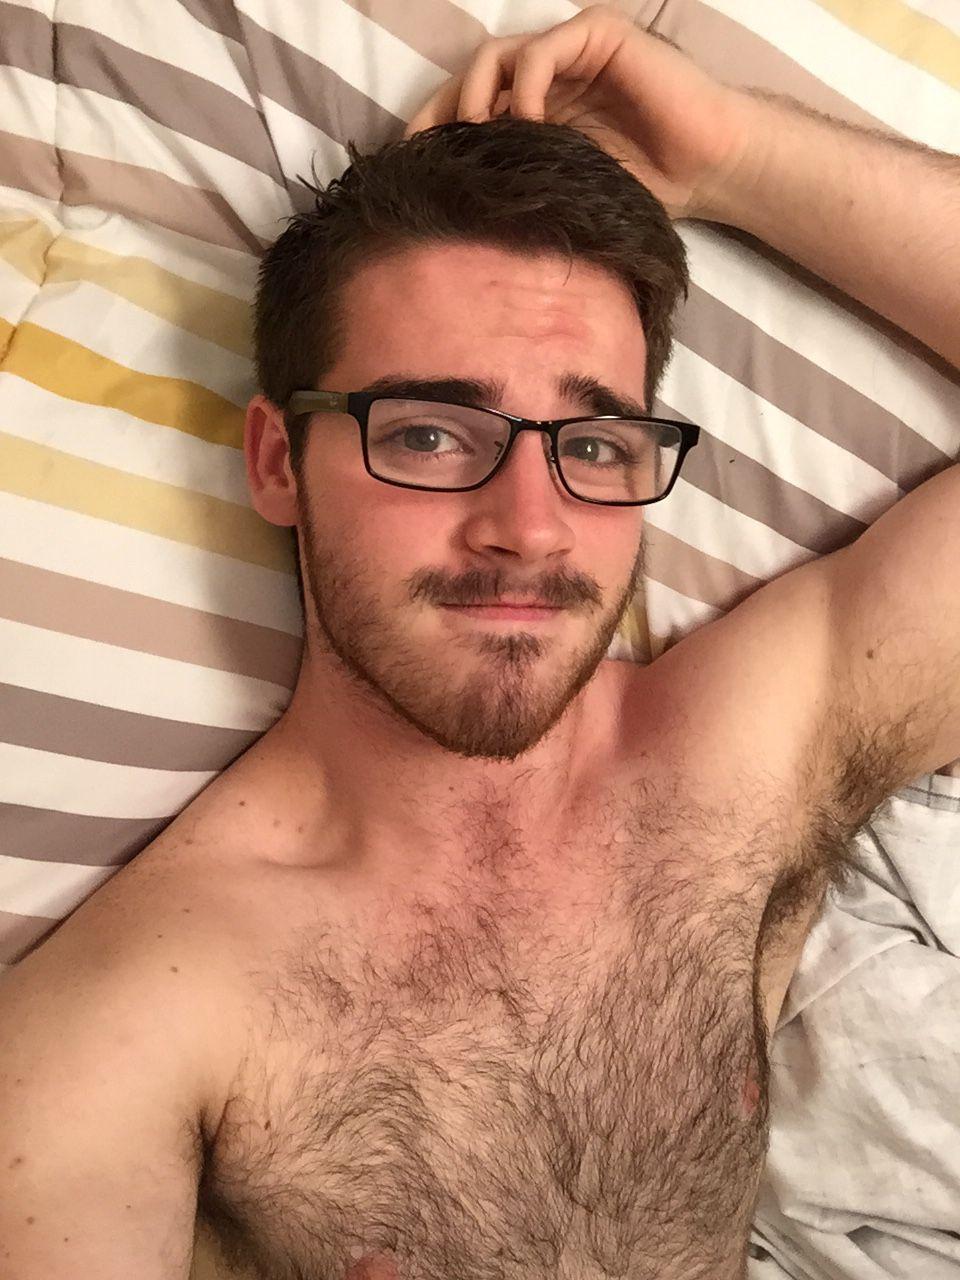 Im a hairy guy